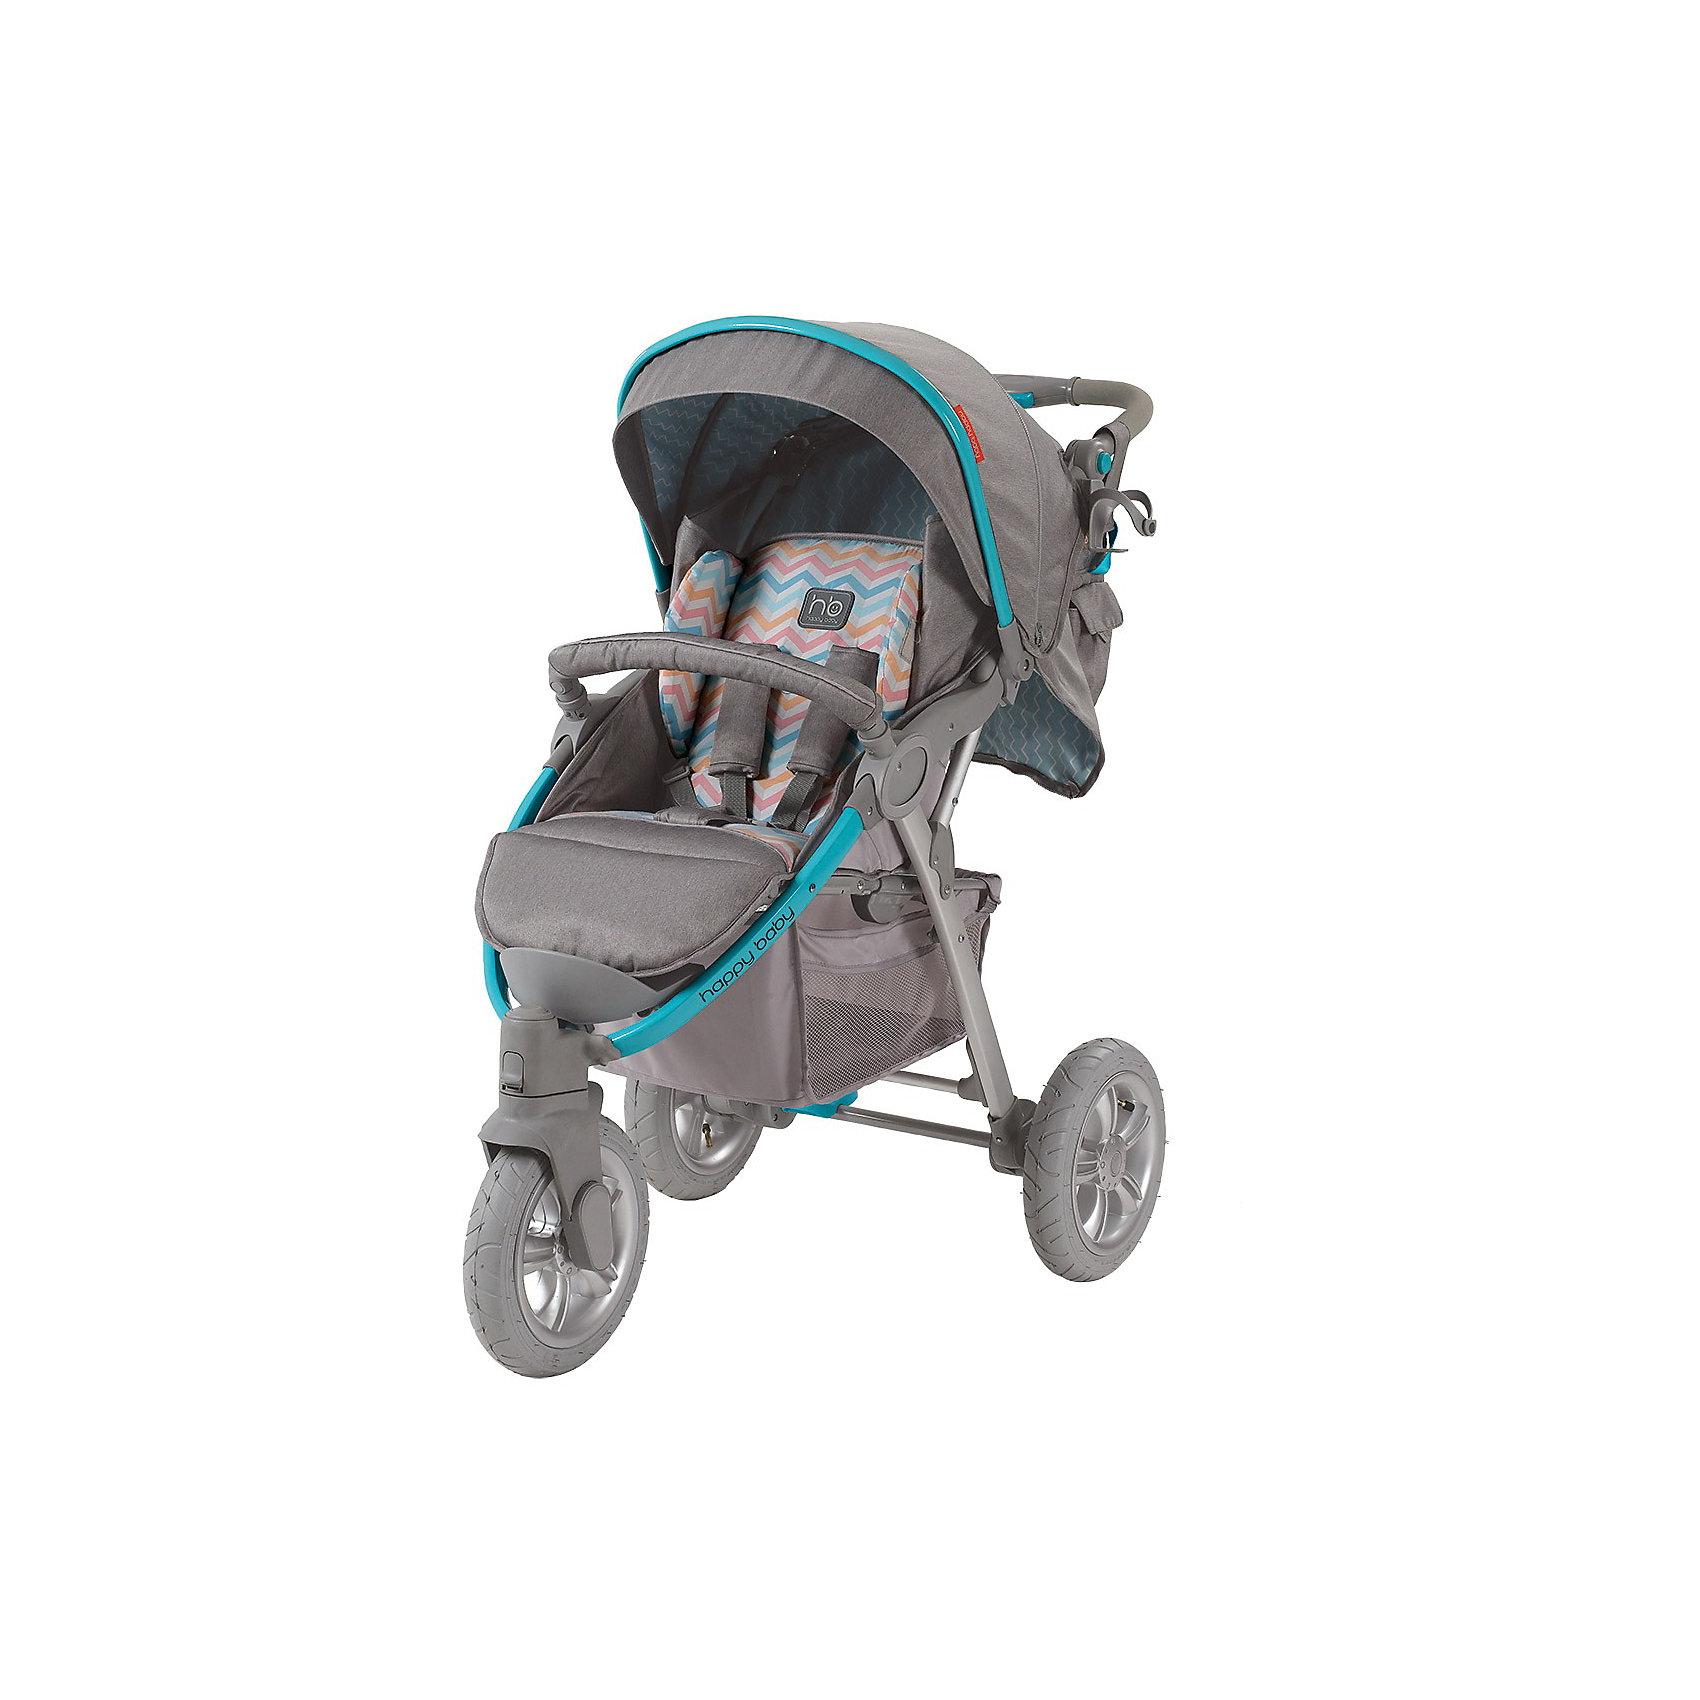 Happy Baby Прогулочная коляска Neon Sport, Happy Baby, купить б у бампер крыло переднее левое фара левая для киа спектра в спб